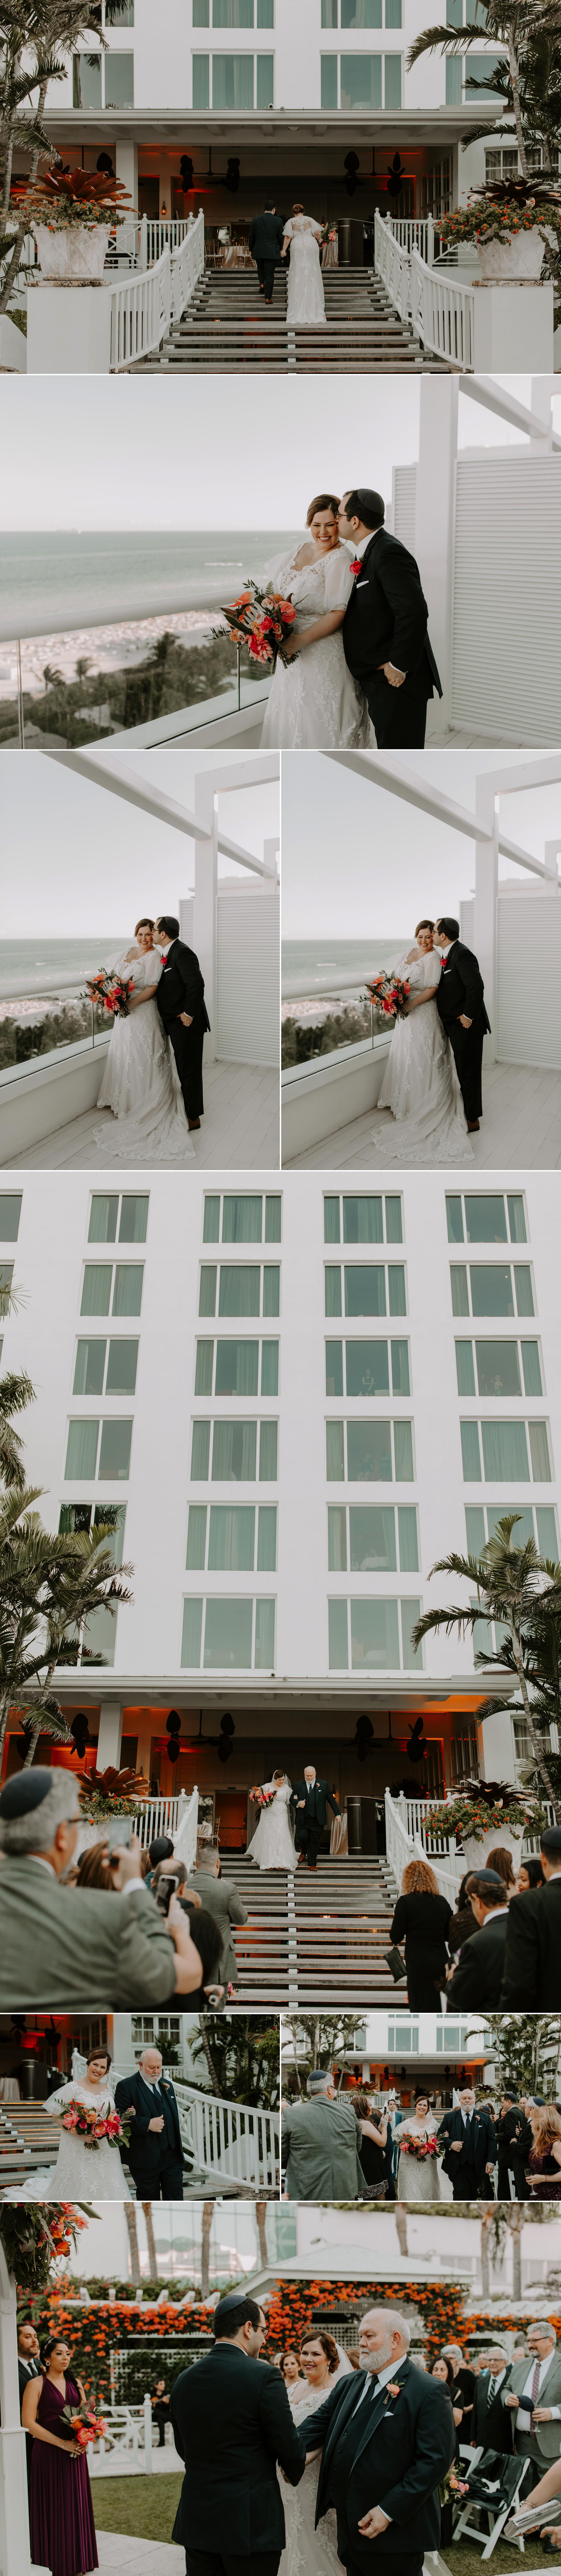 Tropical Miami Beach Wedding at The Palms Hotel